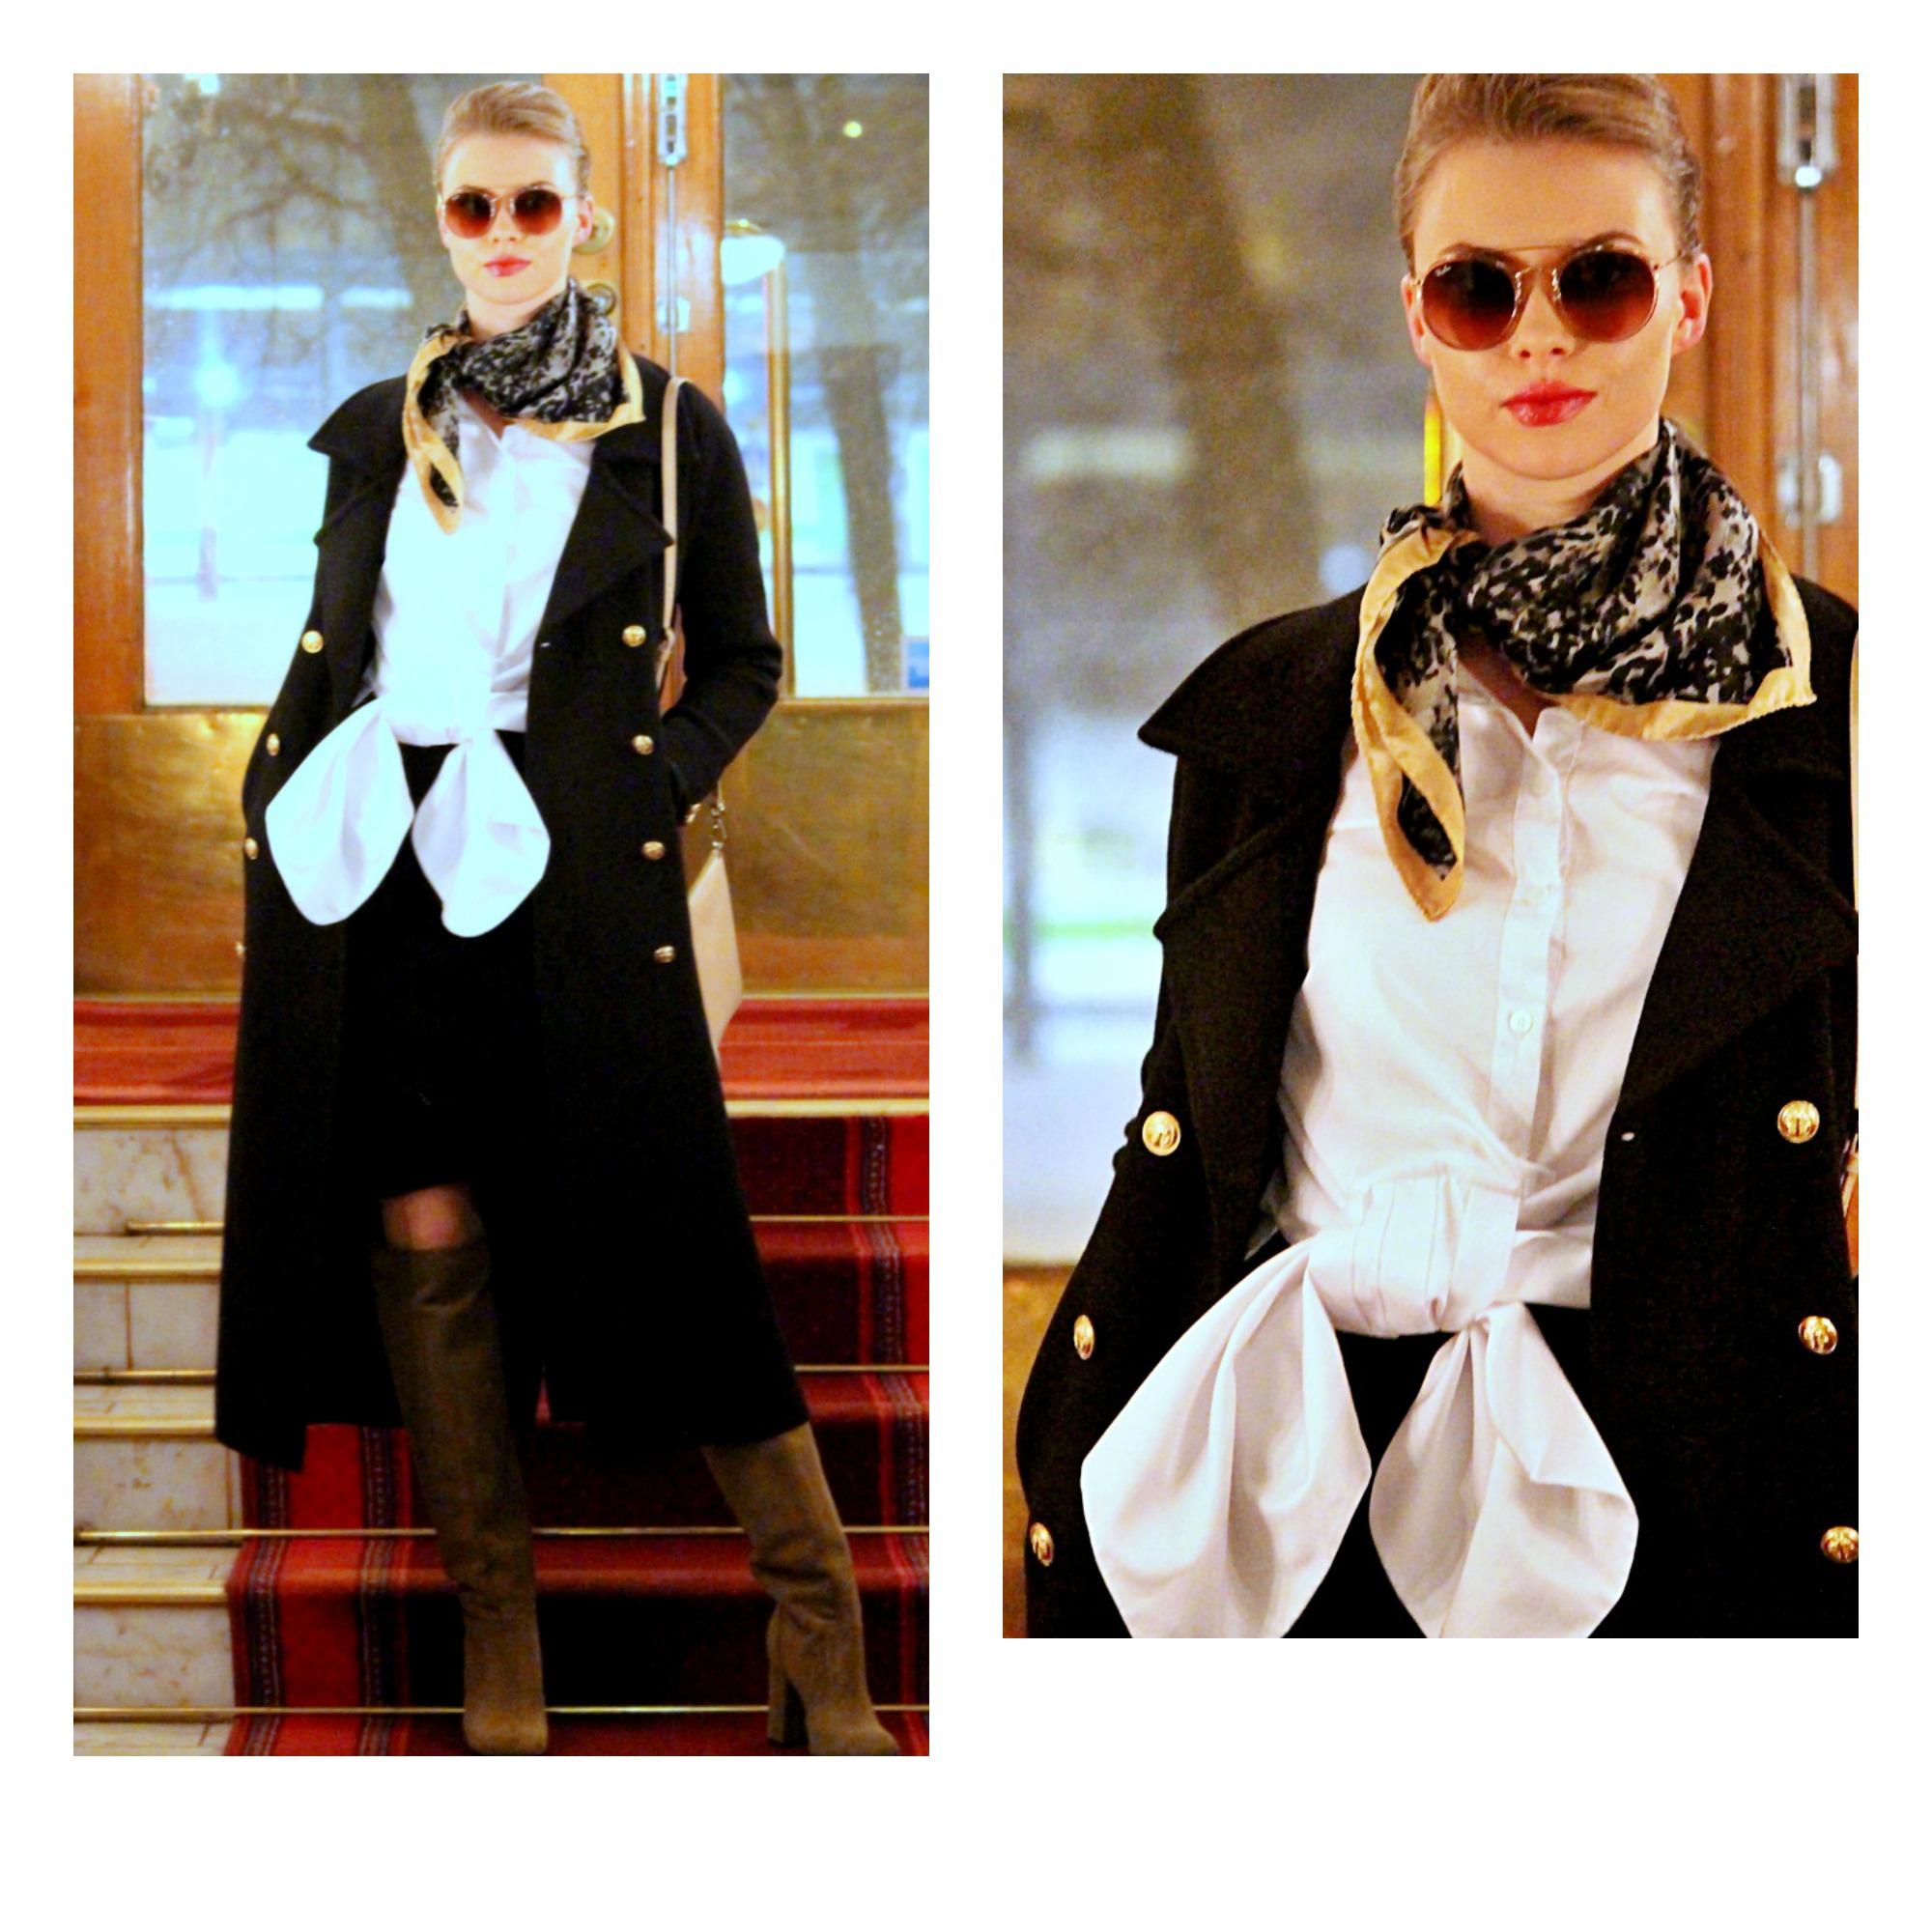 Busnel coat & skirt, Sleek Atelier shirt, Balmuir bag & scarf, afKlingberg booties